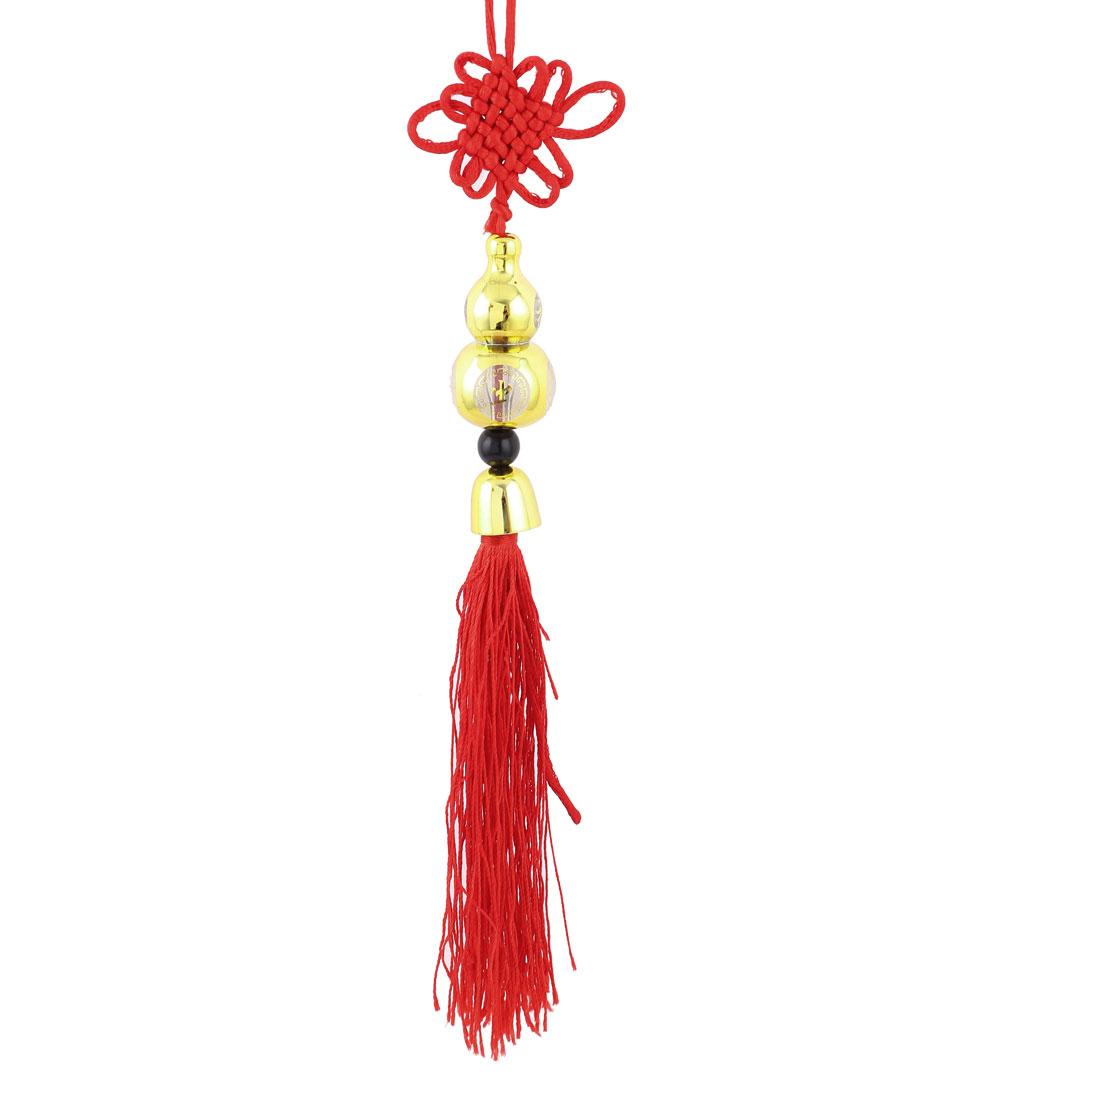 Tassel Detail Calabash Pendant Handmade Chinese Knot Hanging Decor Red Gold Tone